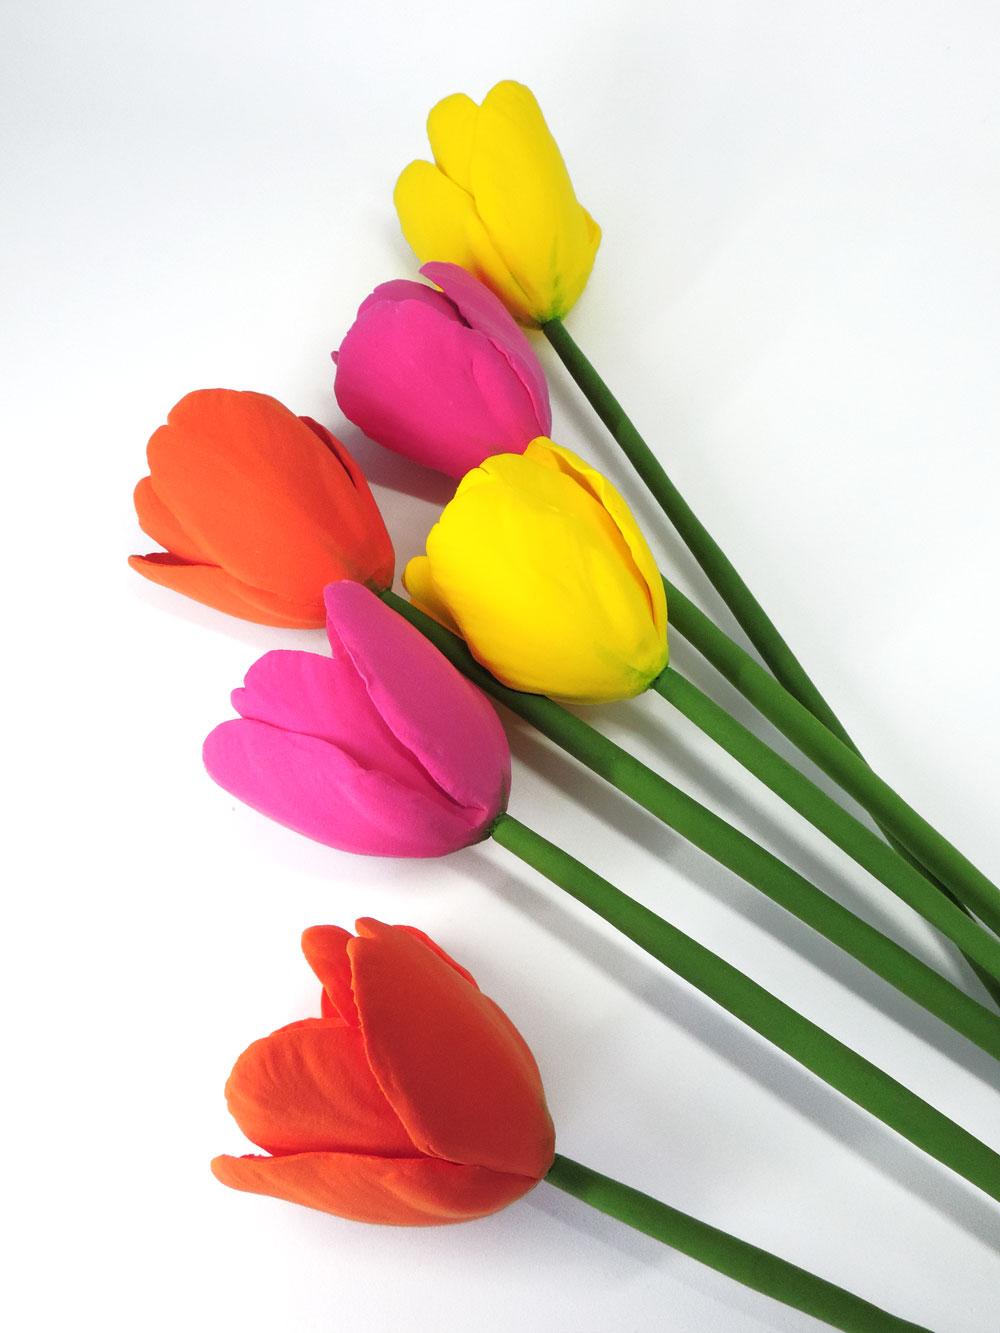 Tulips_02.jpg